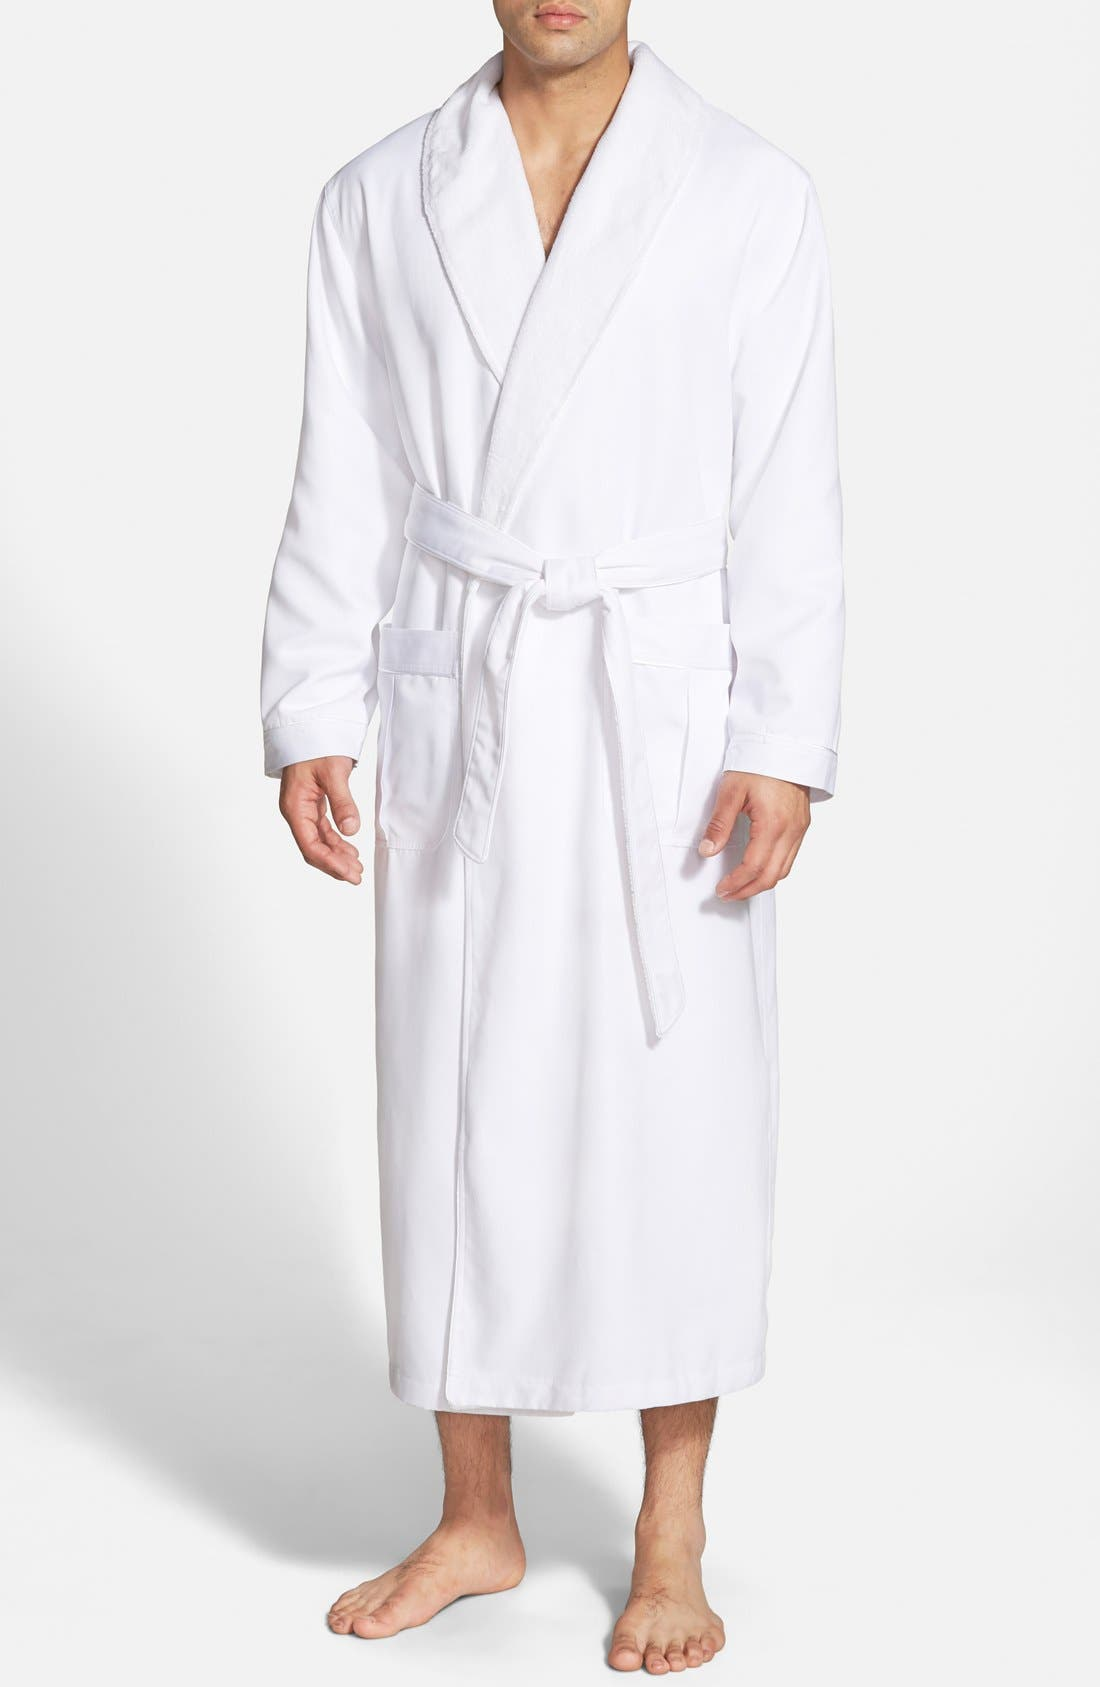 Main Image - Majestic International Fleece Lined Robe